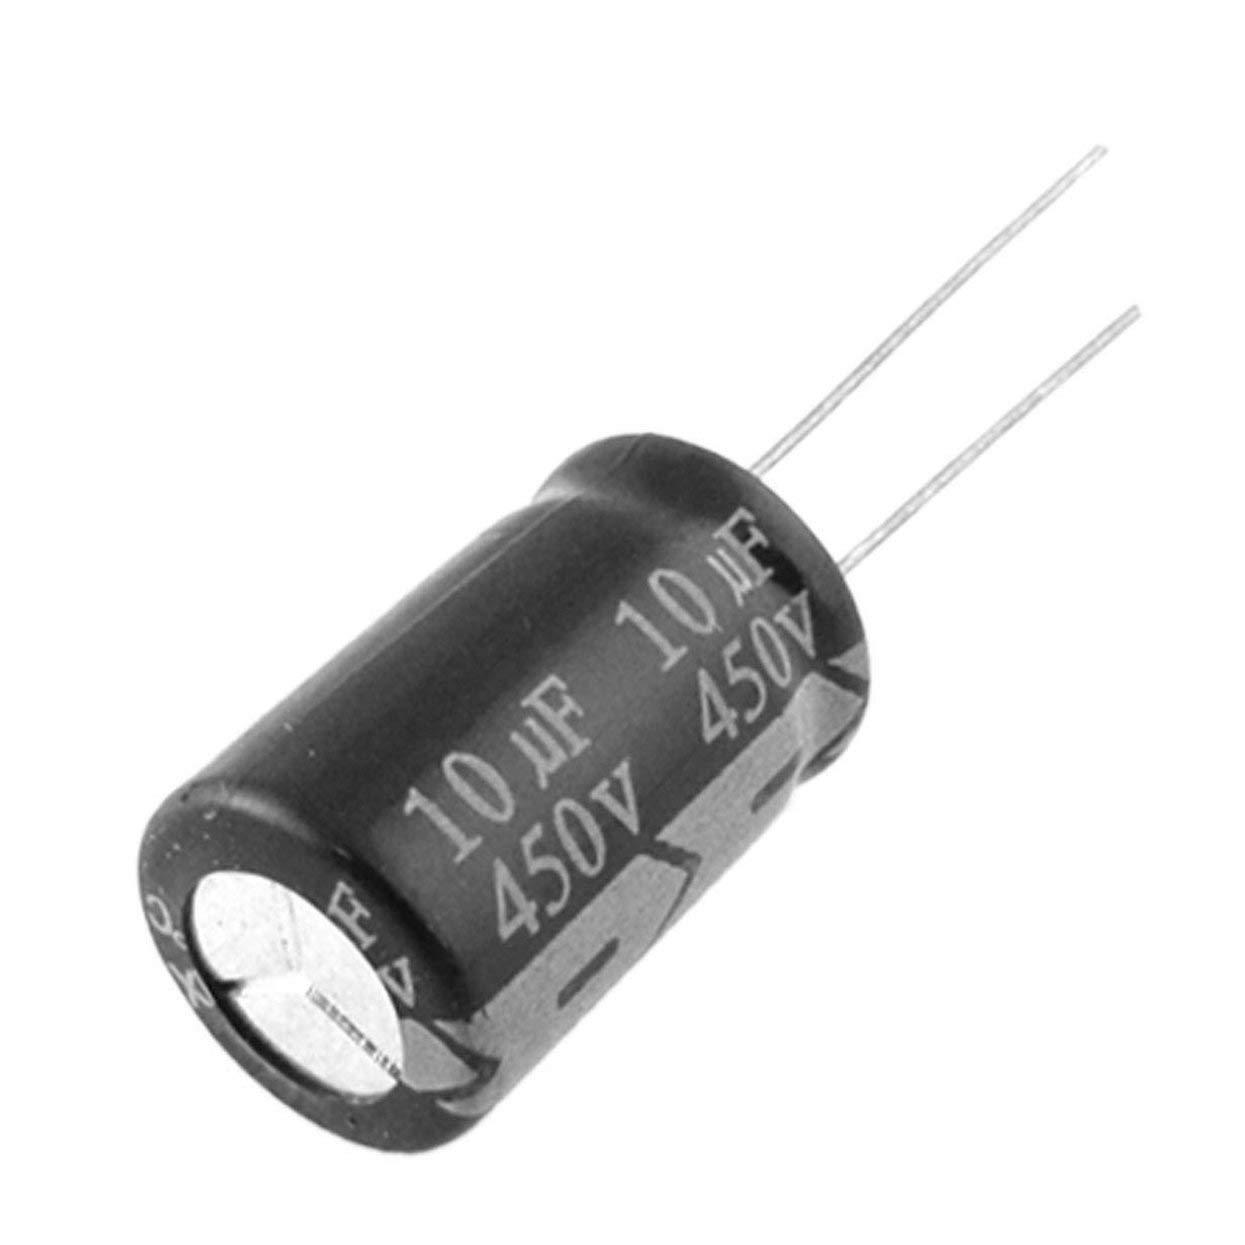 Tellaboull for 2Pcs Condensateurs électrolytiques 450V 10uF HIGT Qualité 10UF 450V Condensateur